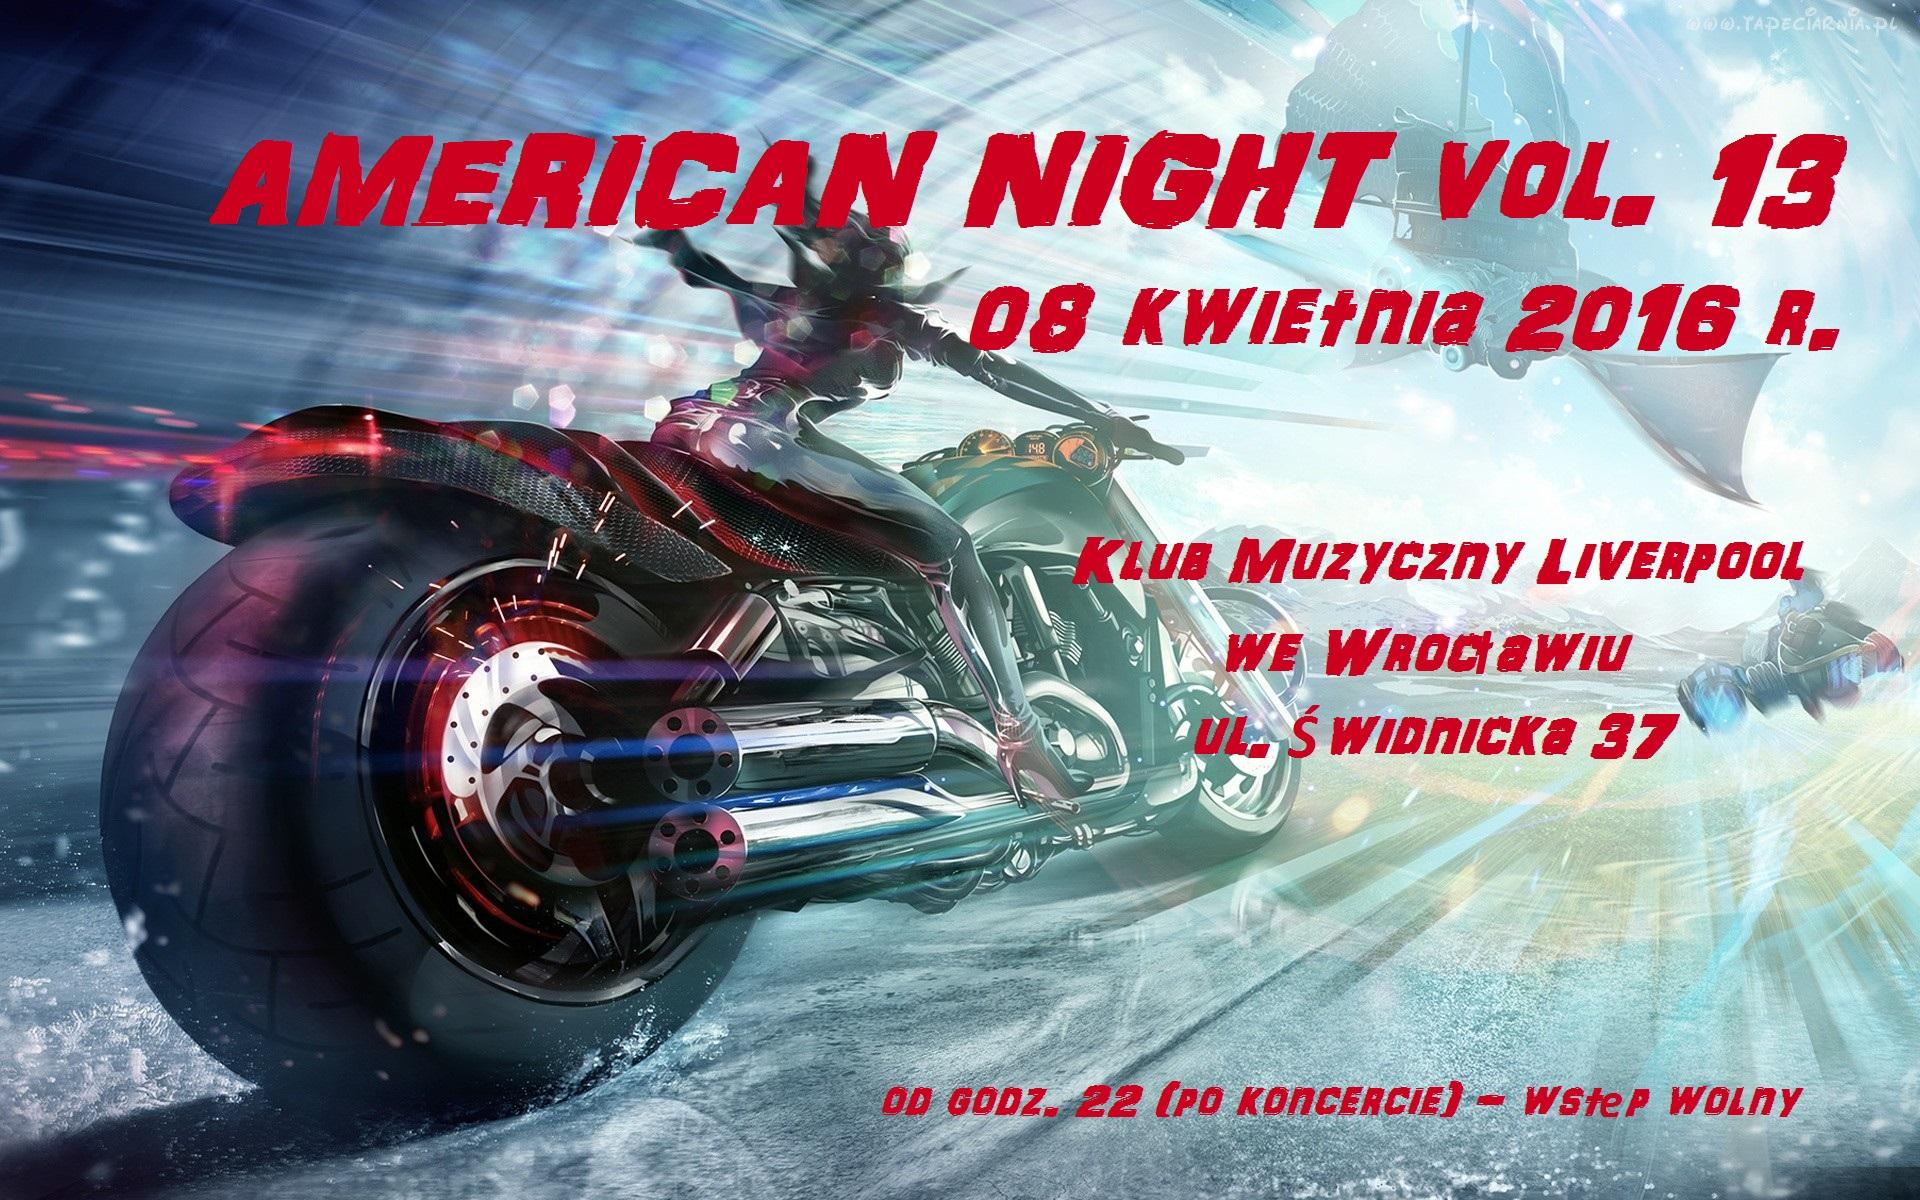 AMERICAN NIGHT vol. 13